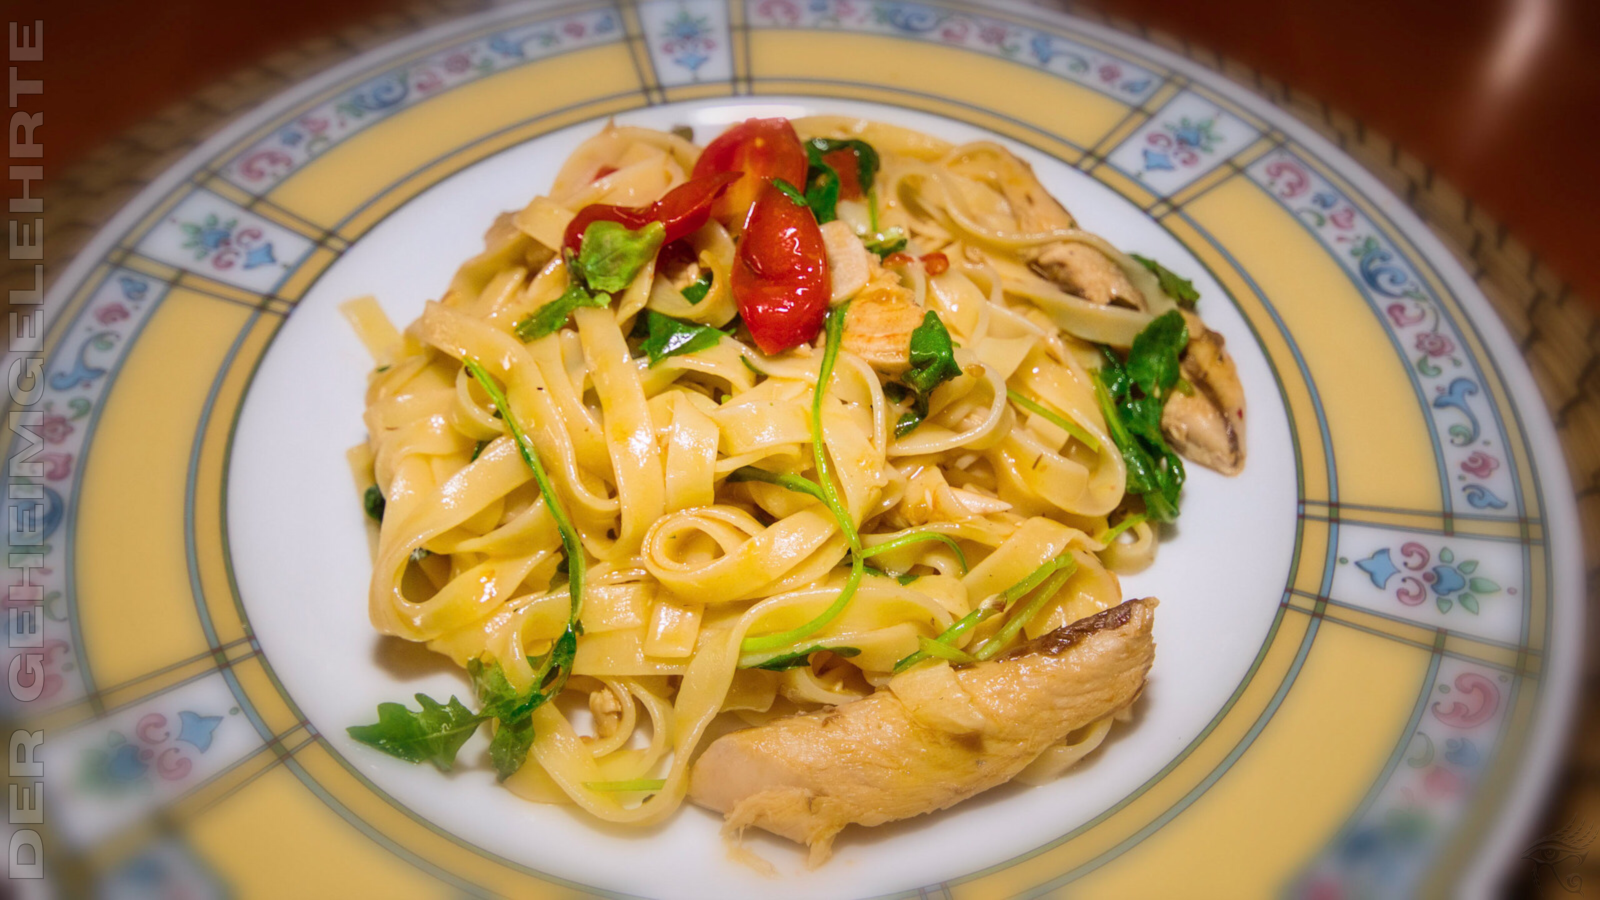 Tagliatelle mit Makrele, Tomaten und Rucola